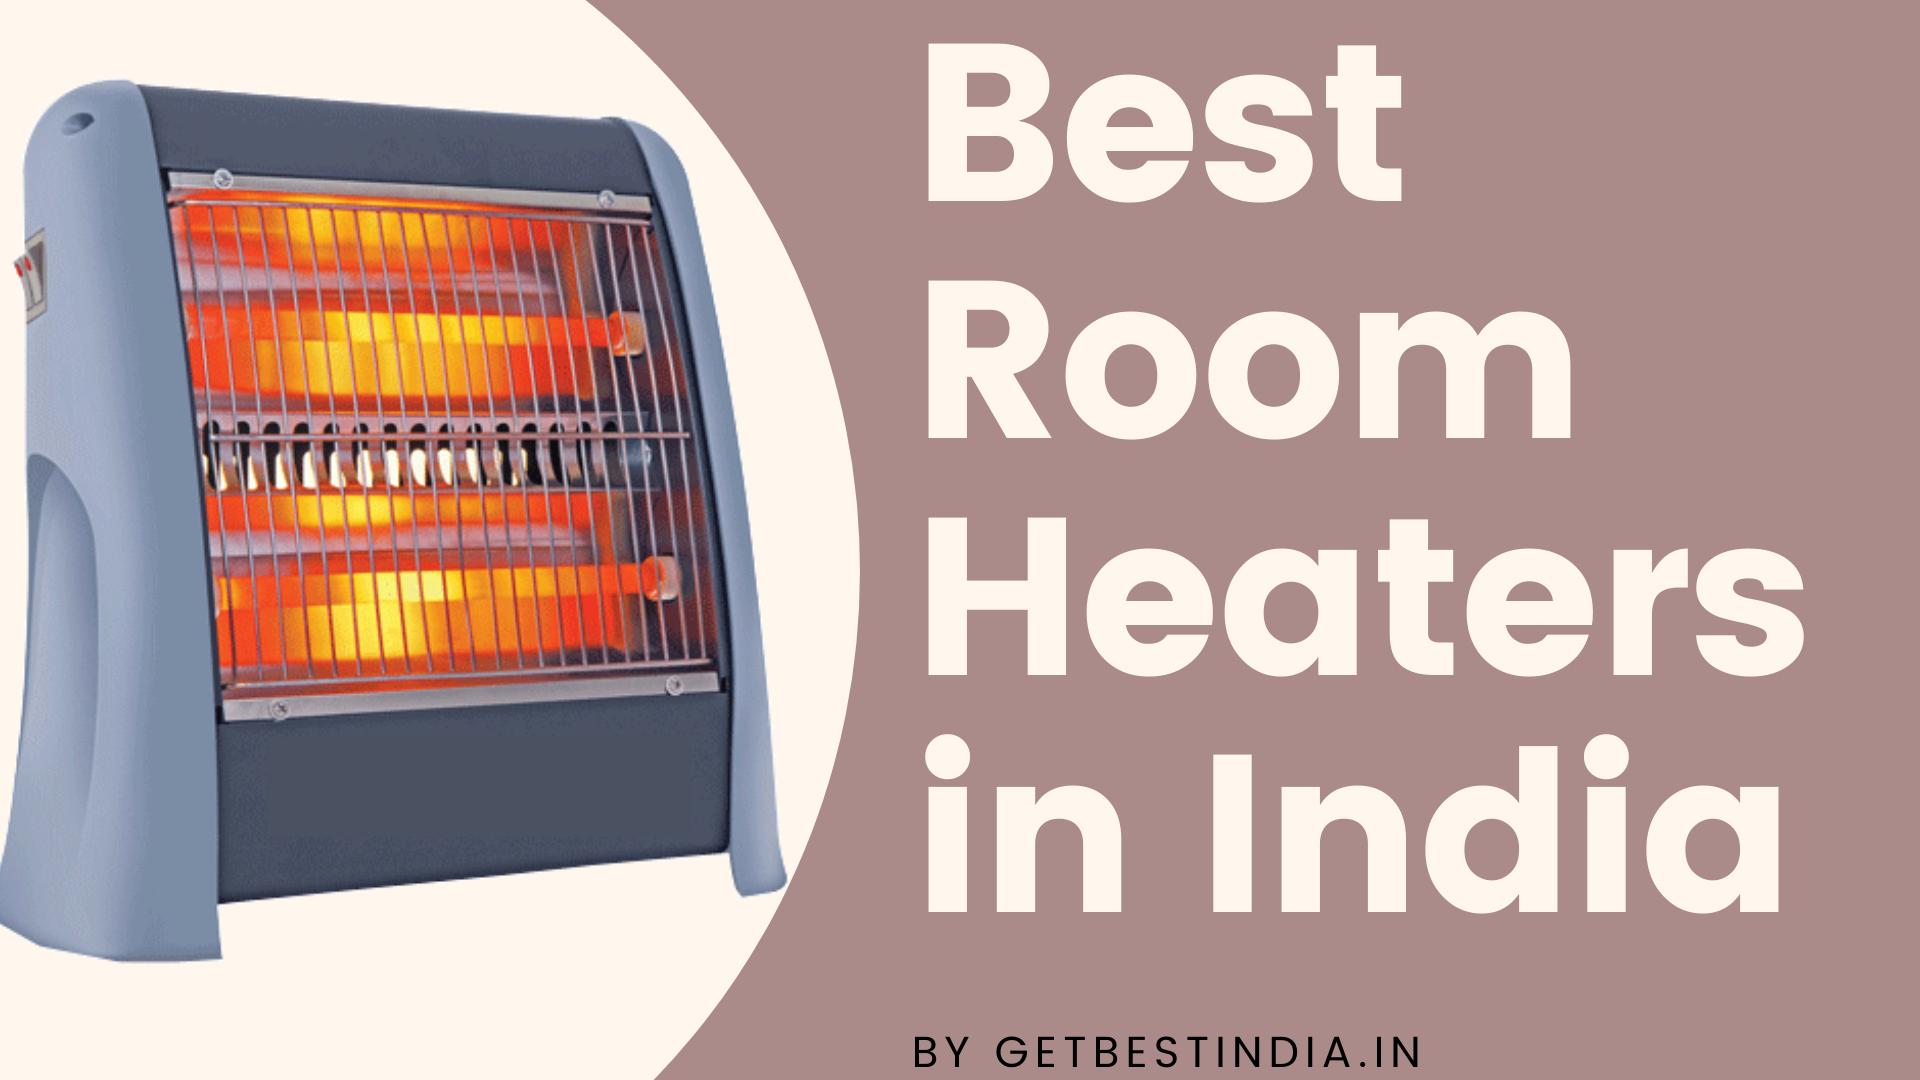 12 Best Room Heater to Buy in India 2020